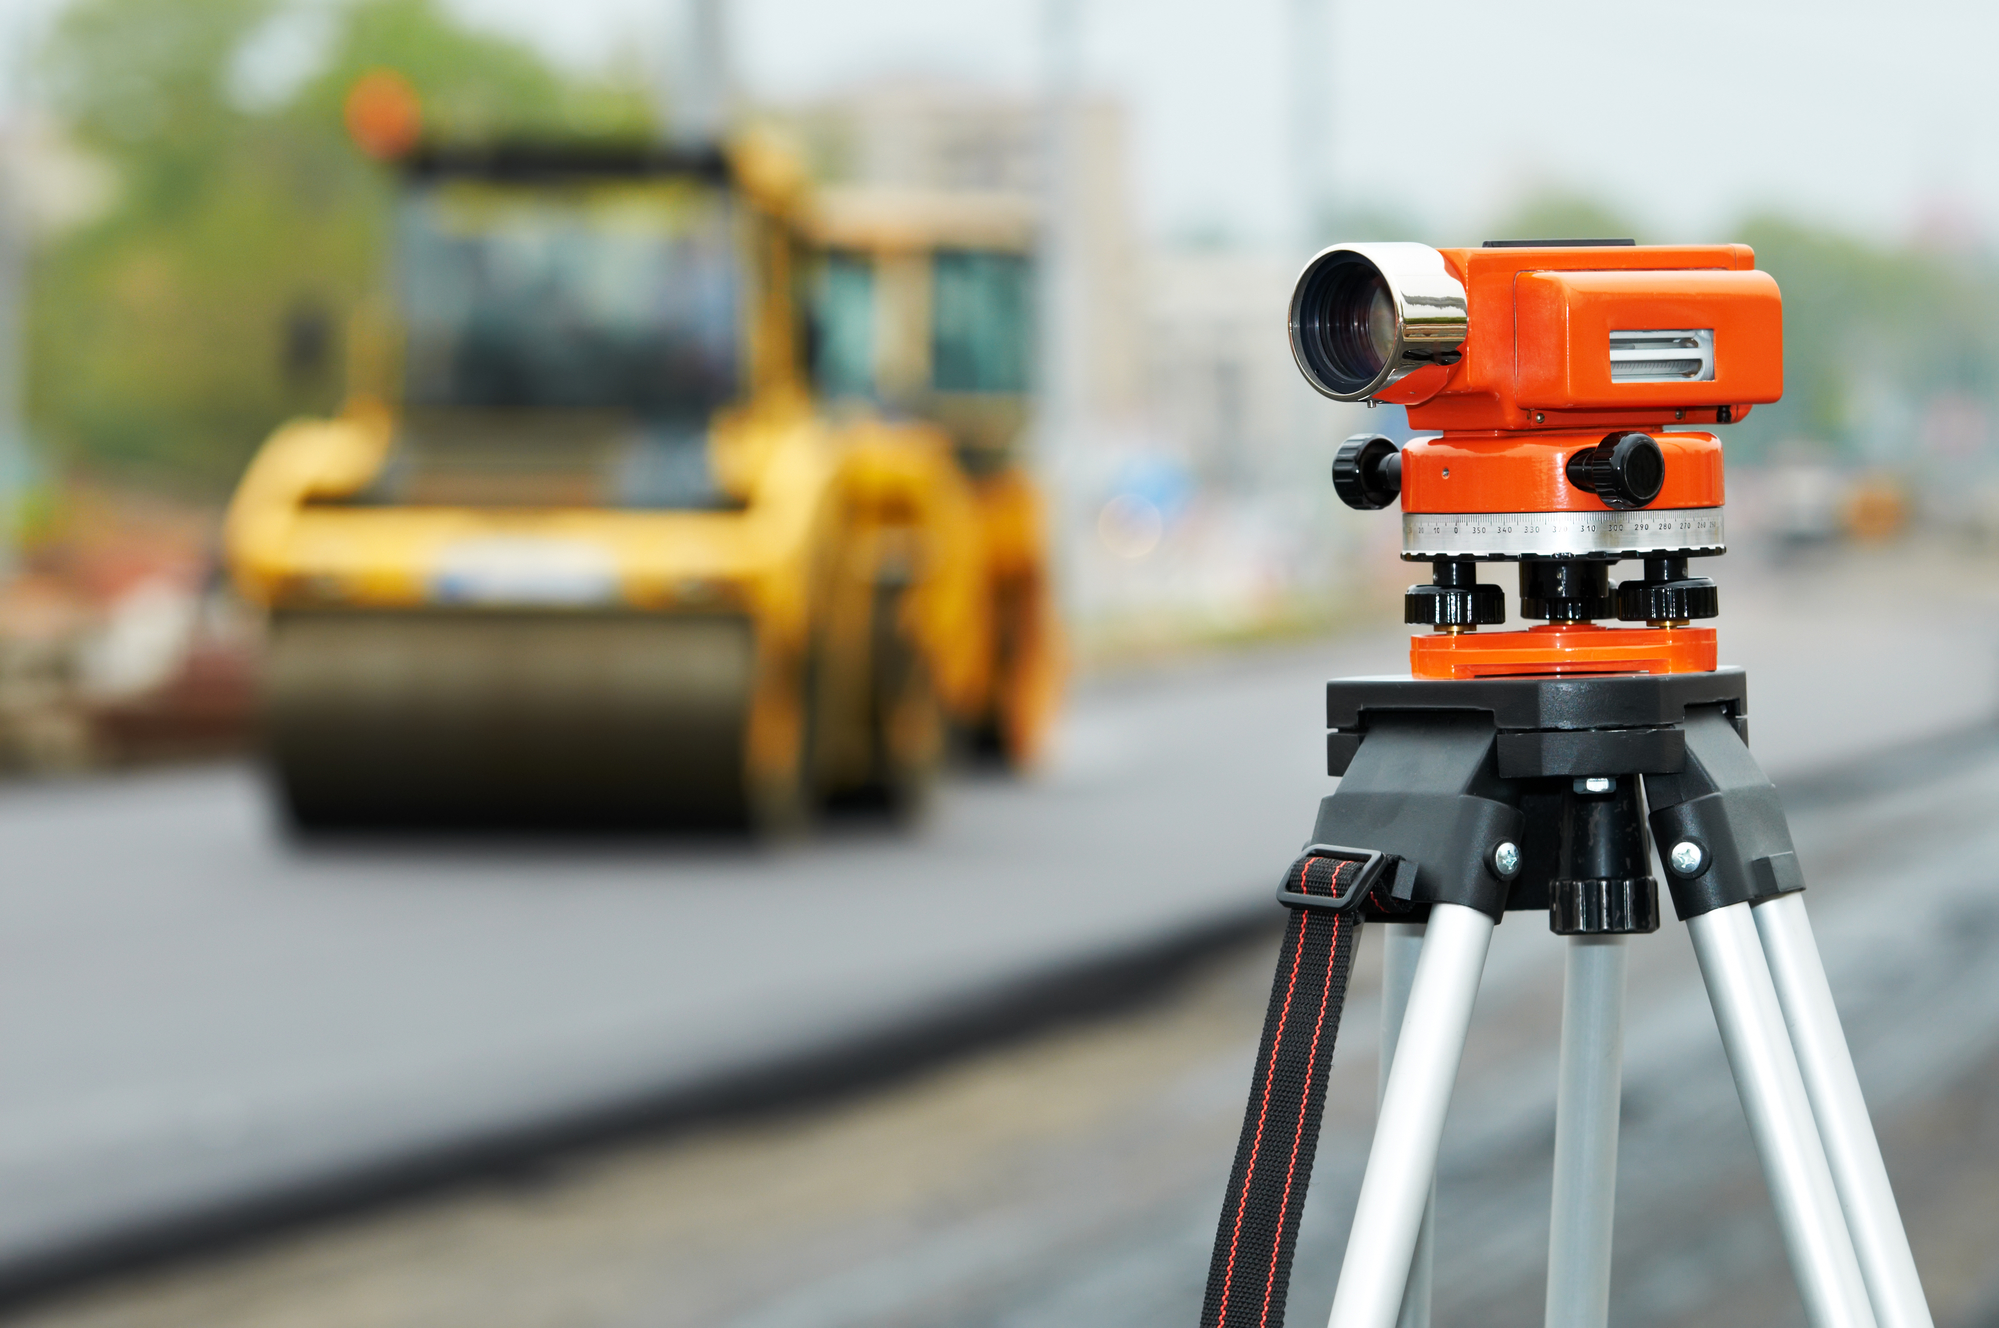 Construction surveyor equipment theodolite level tool during asphalt paving works with compactor roller at background